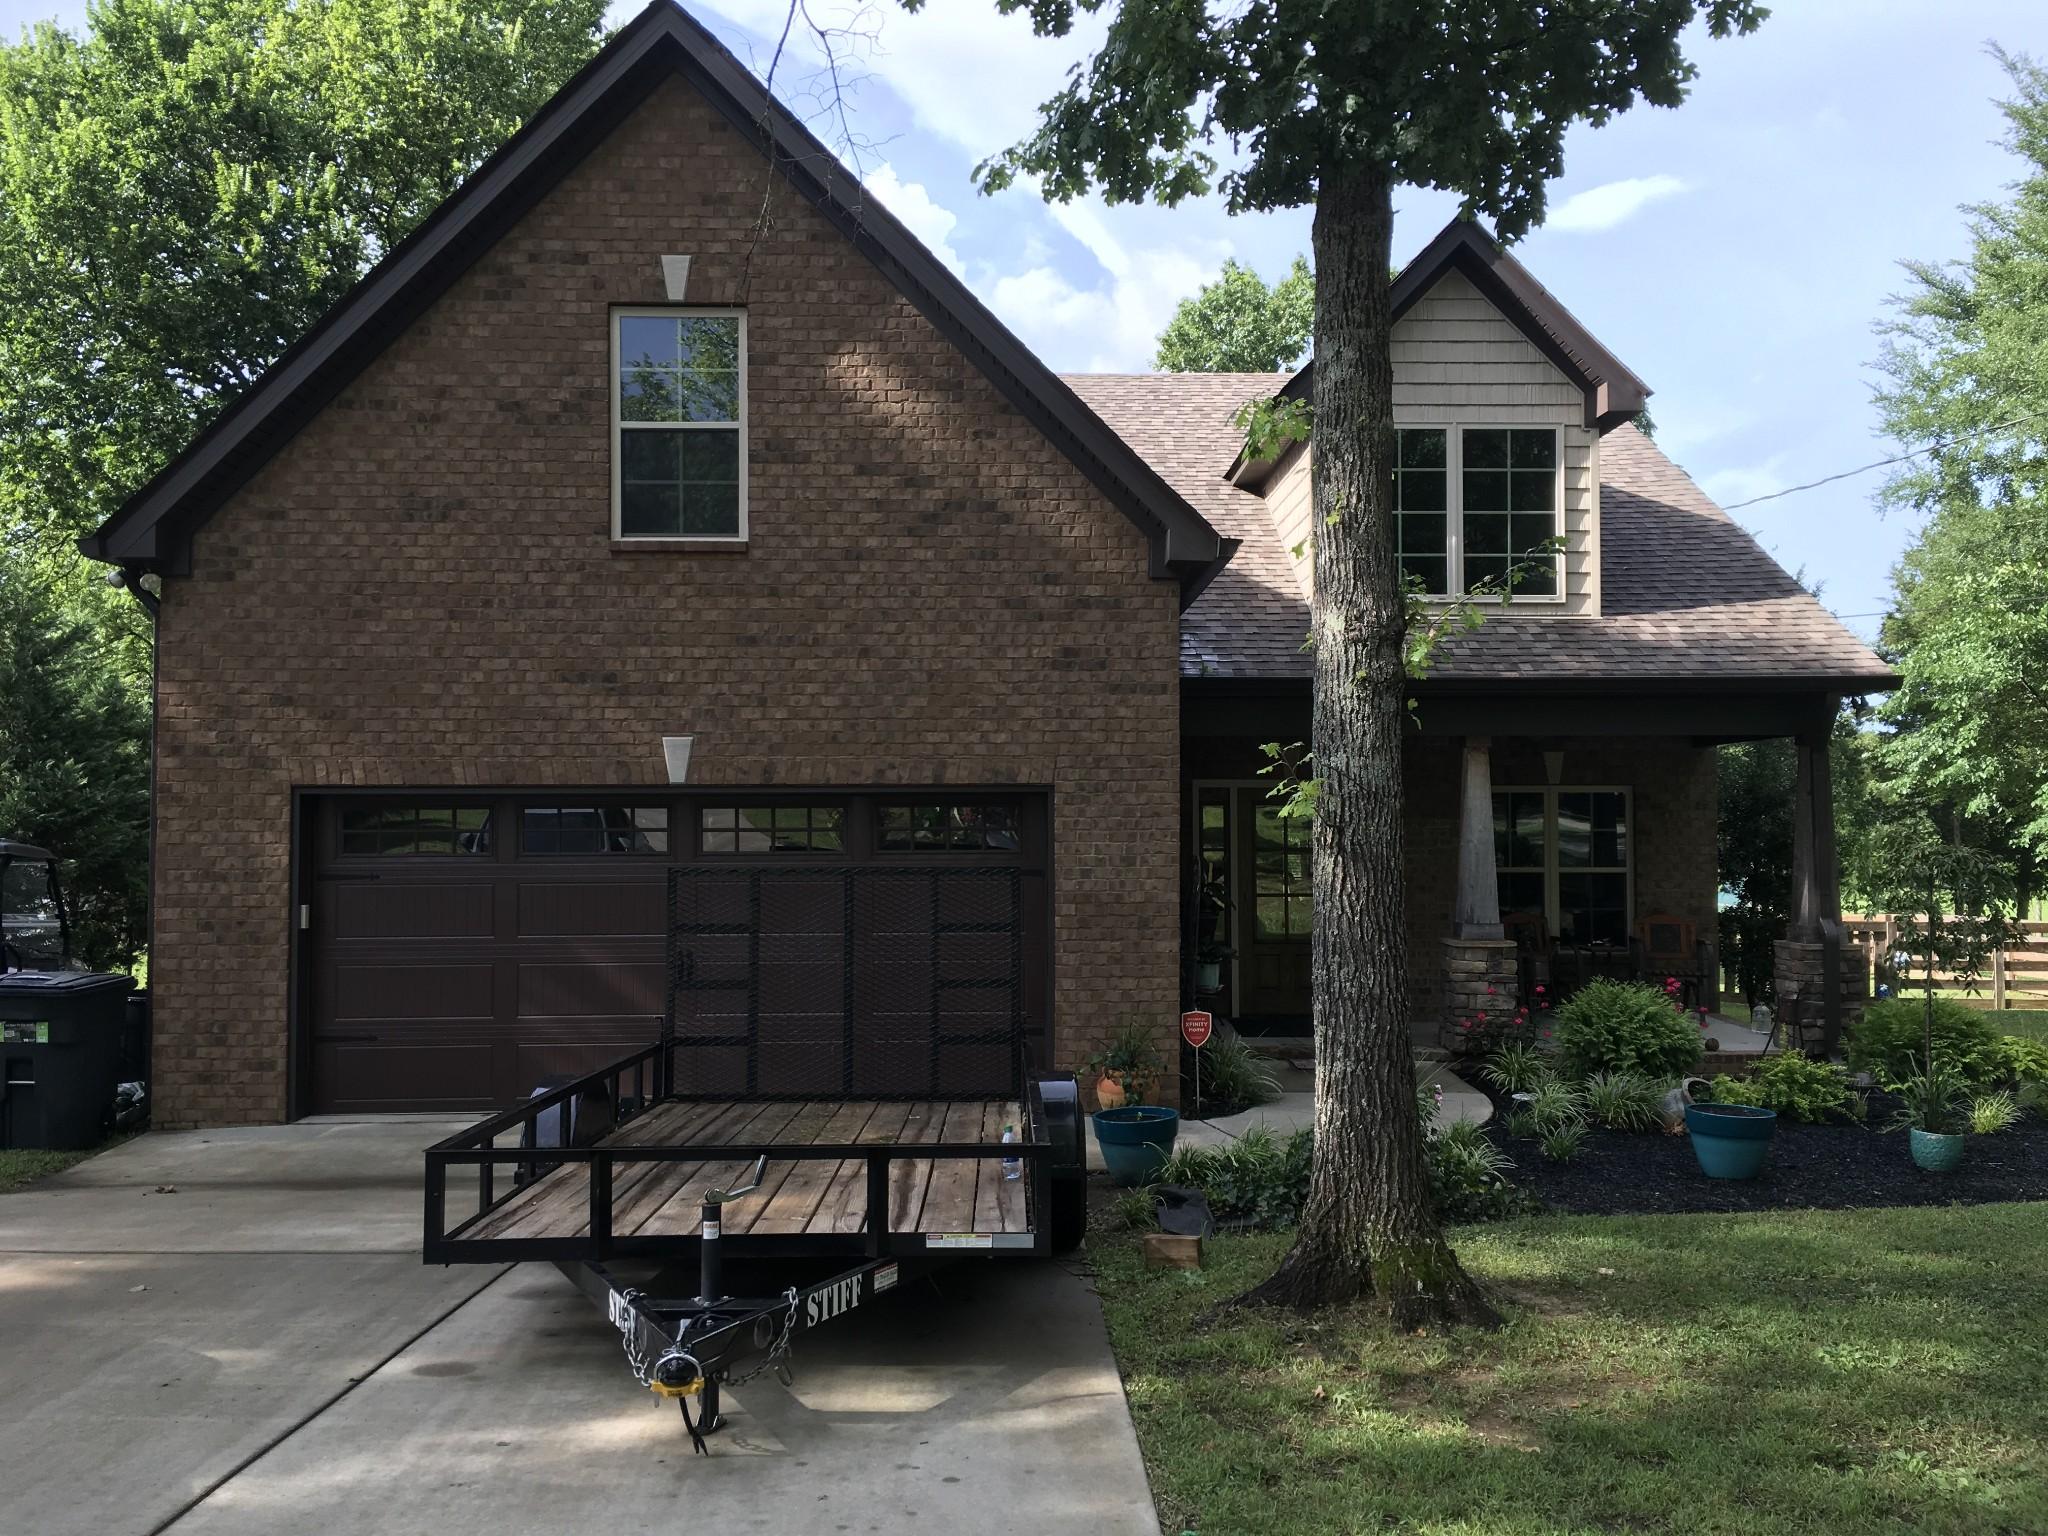 14870 Mount Pleasant Rd, Rockvale, TN 37153 - Rockvale, TN real estate listing